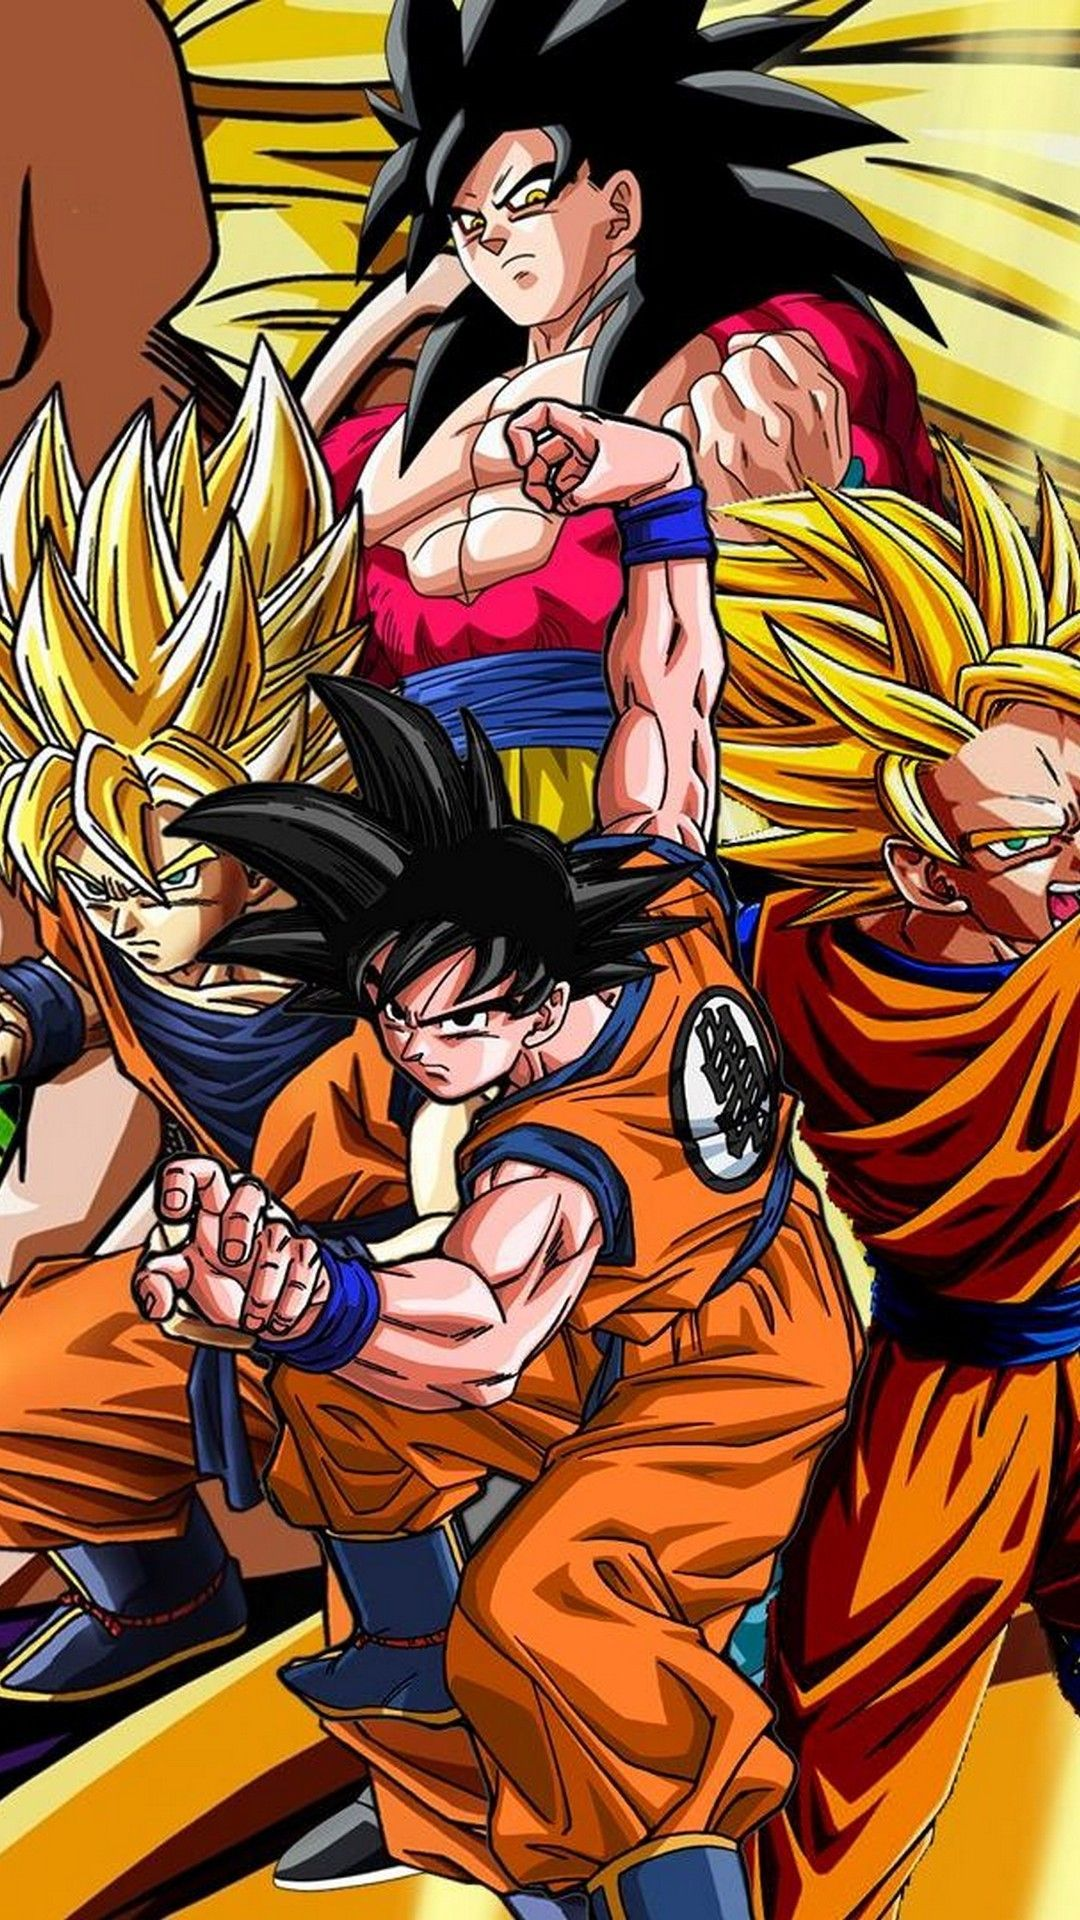 Goku ssj4 wallpapers top free goku ssj4 backgrounds - Ssj4 vegeta wallpaper ...